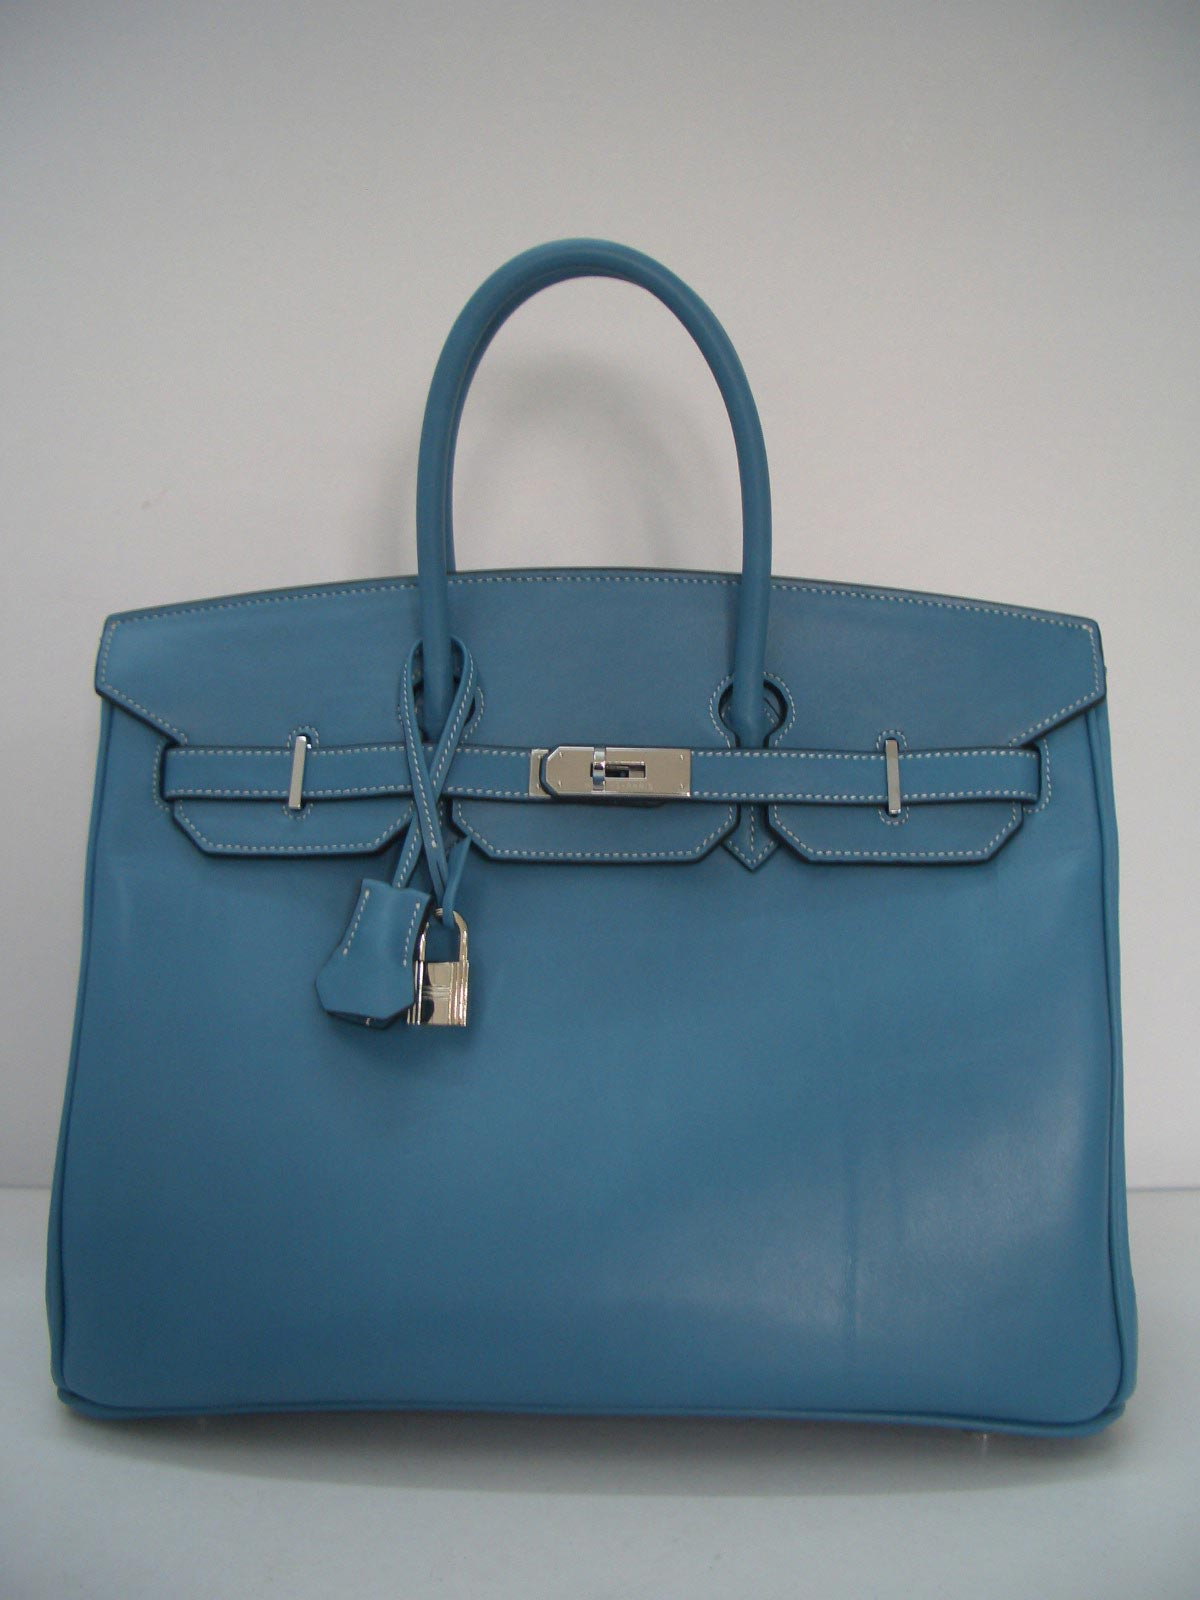 Hermes Birkin Box Calf Leather Box Calf Leather Blue